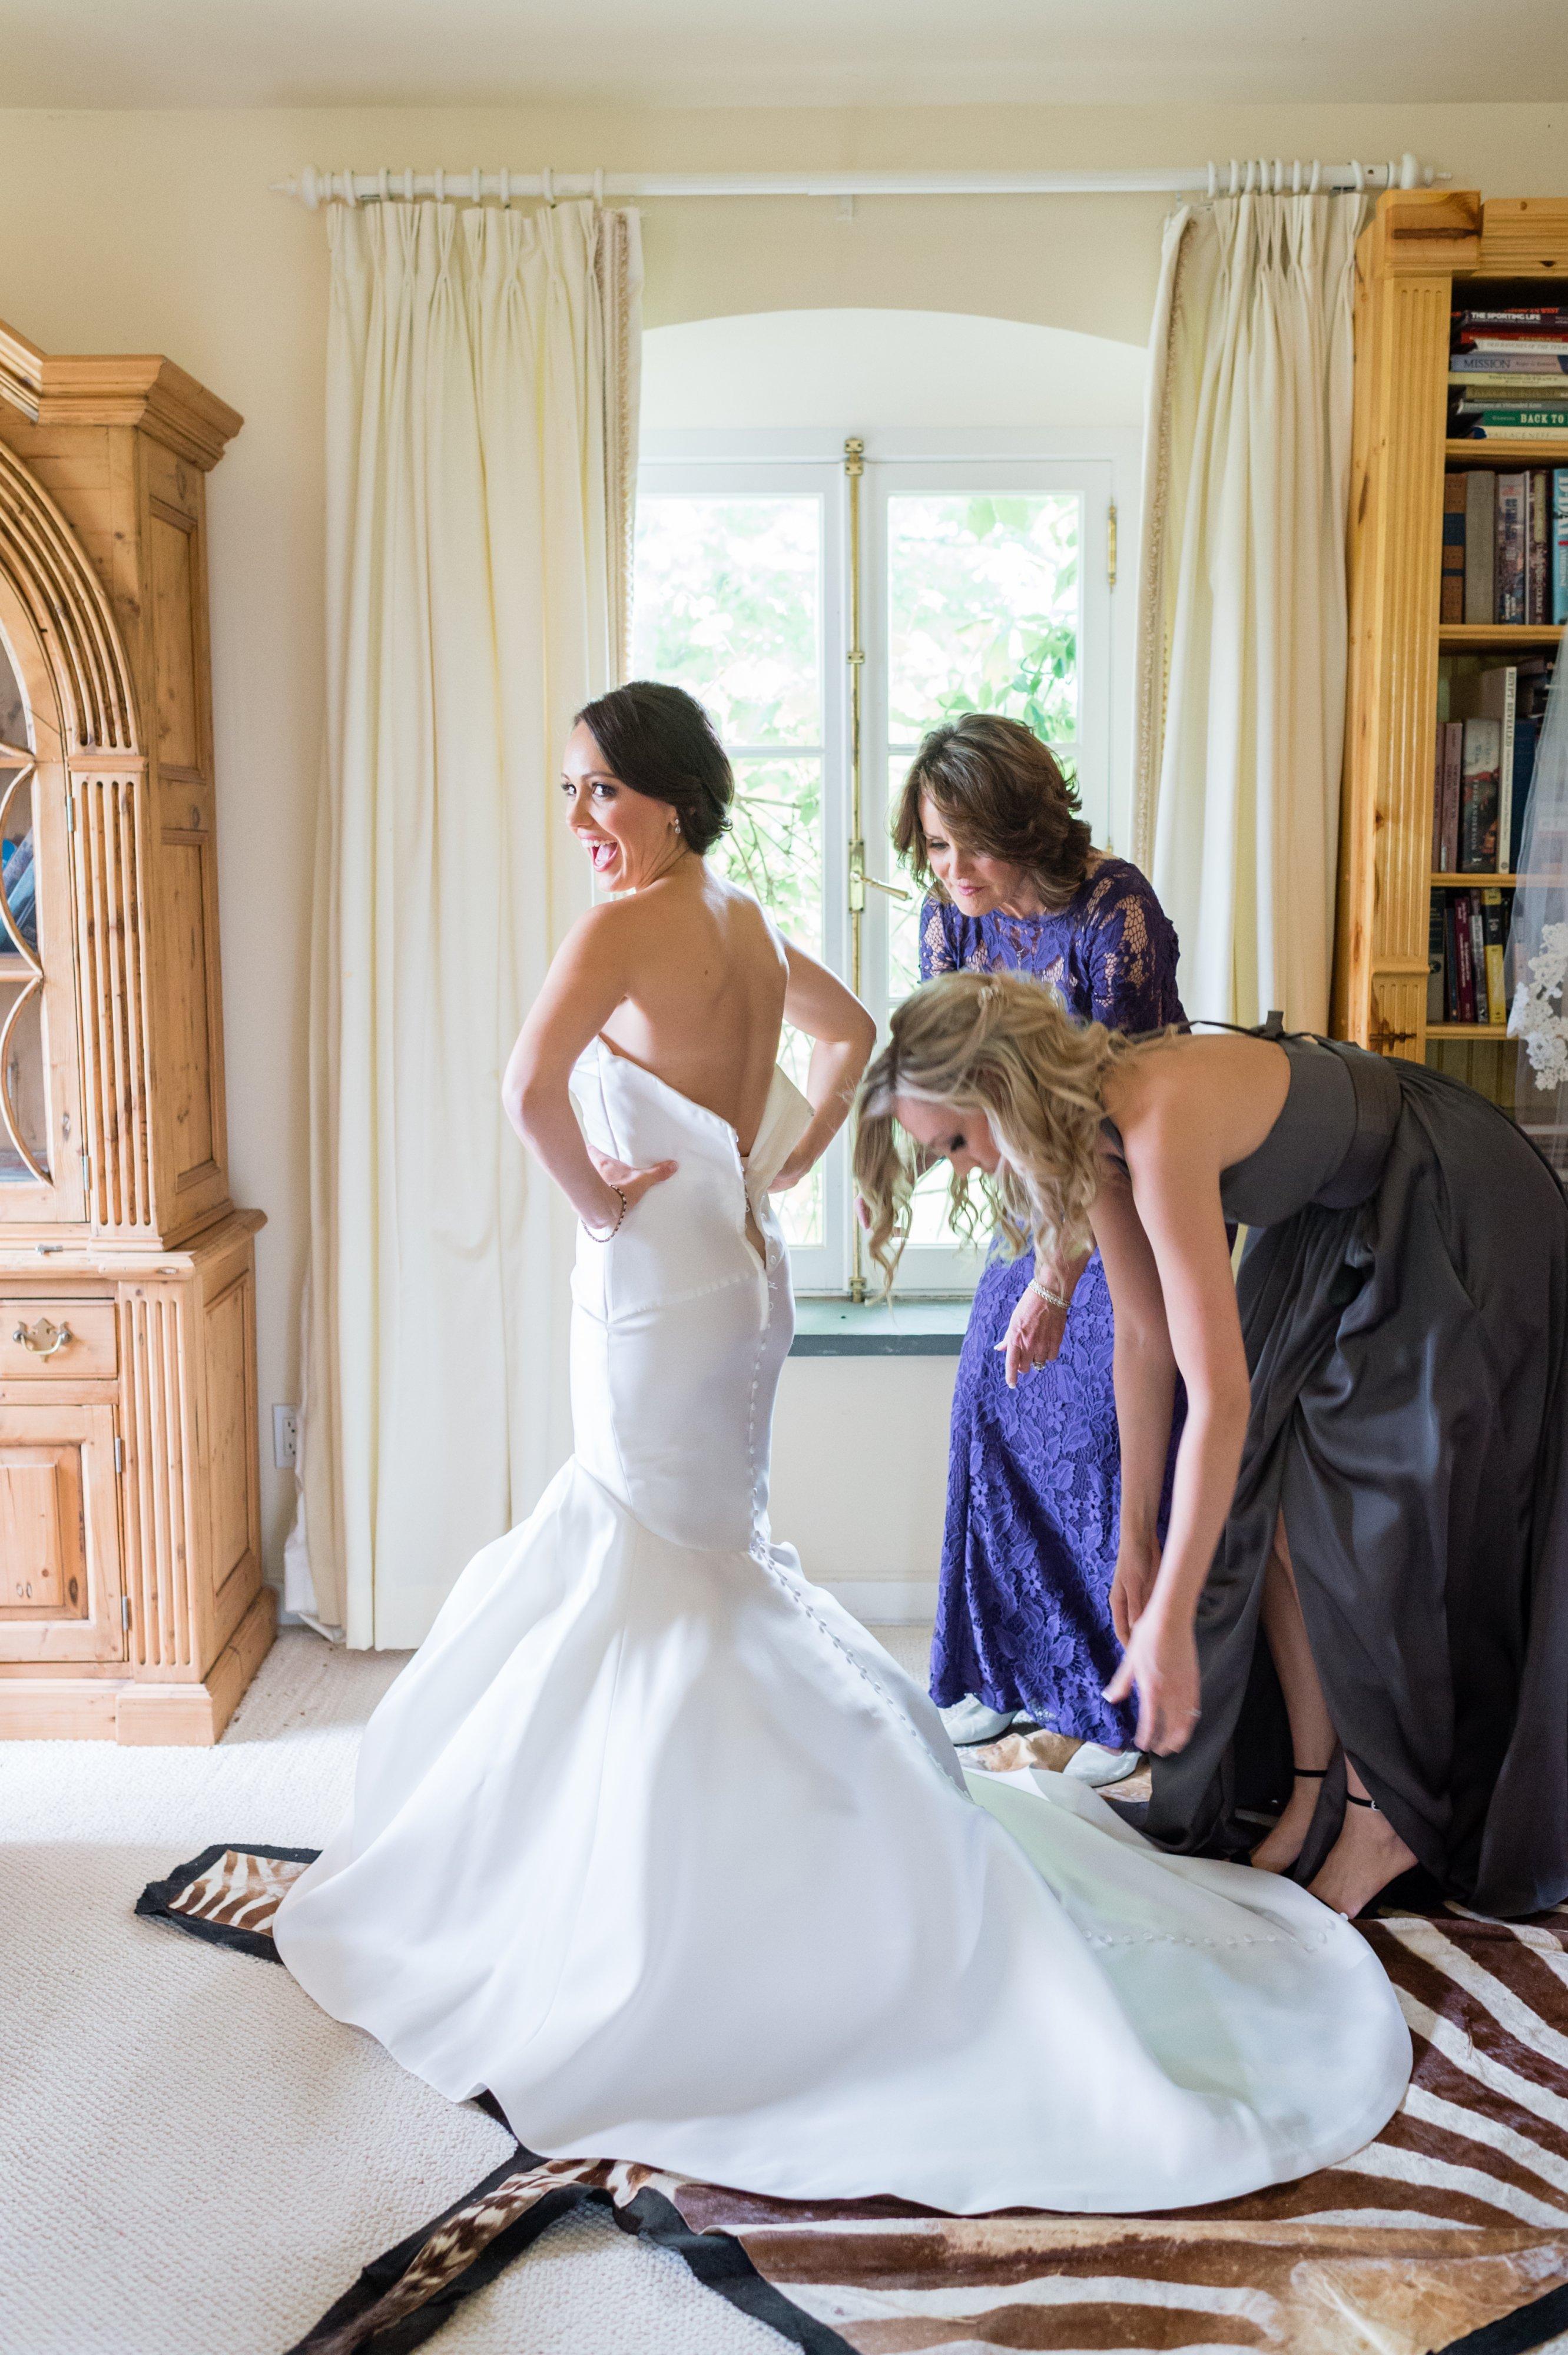 will sharp maketto mick jagger wedding